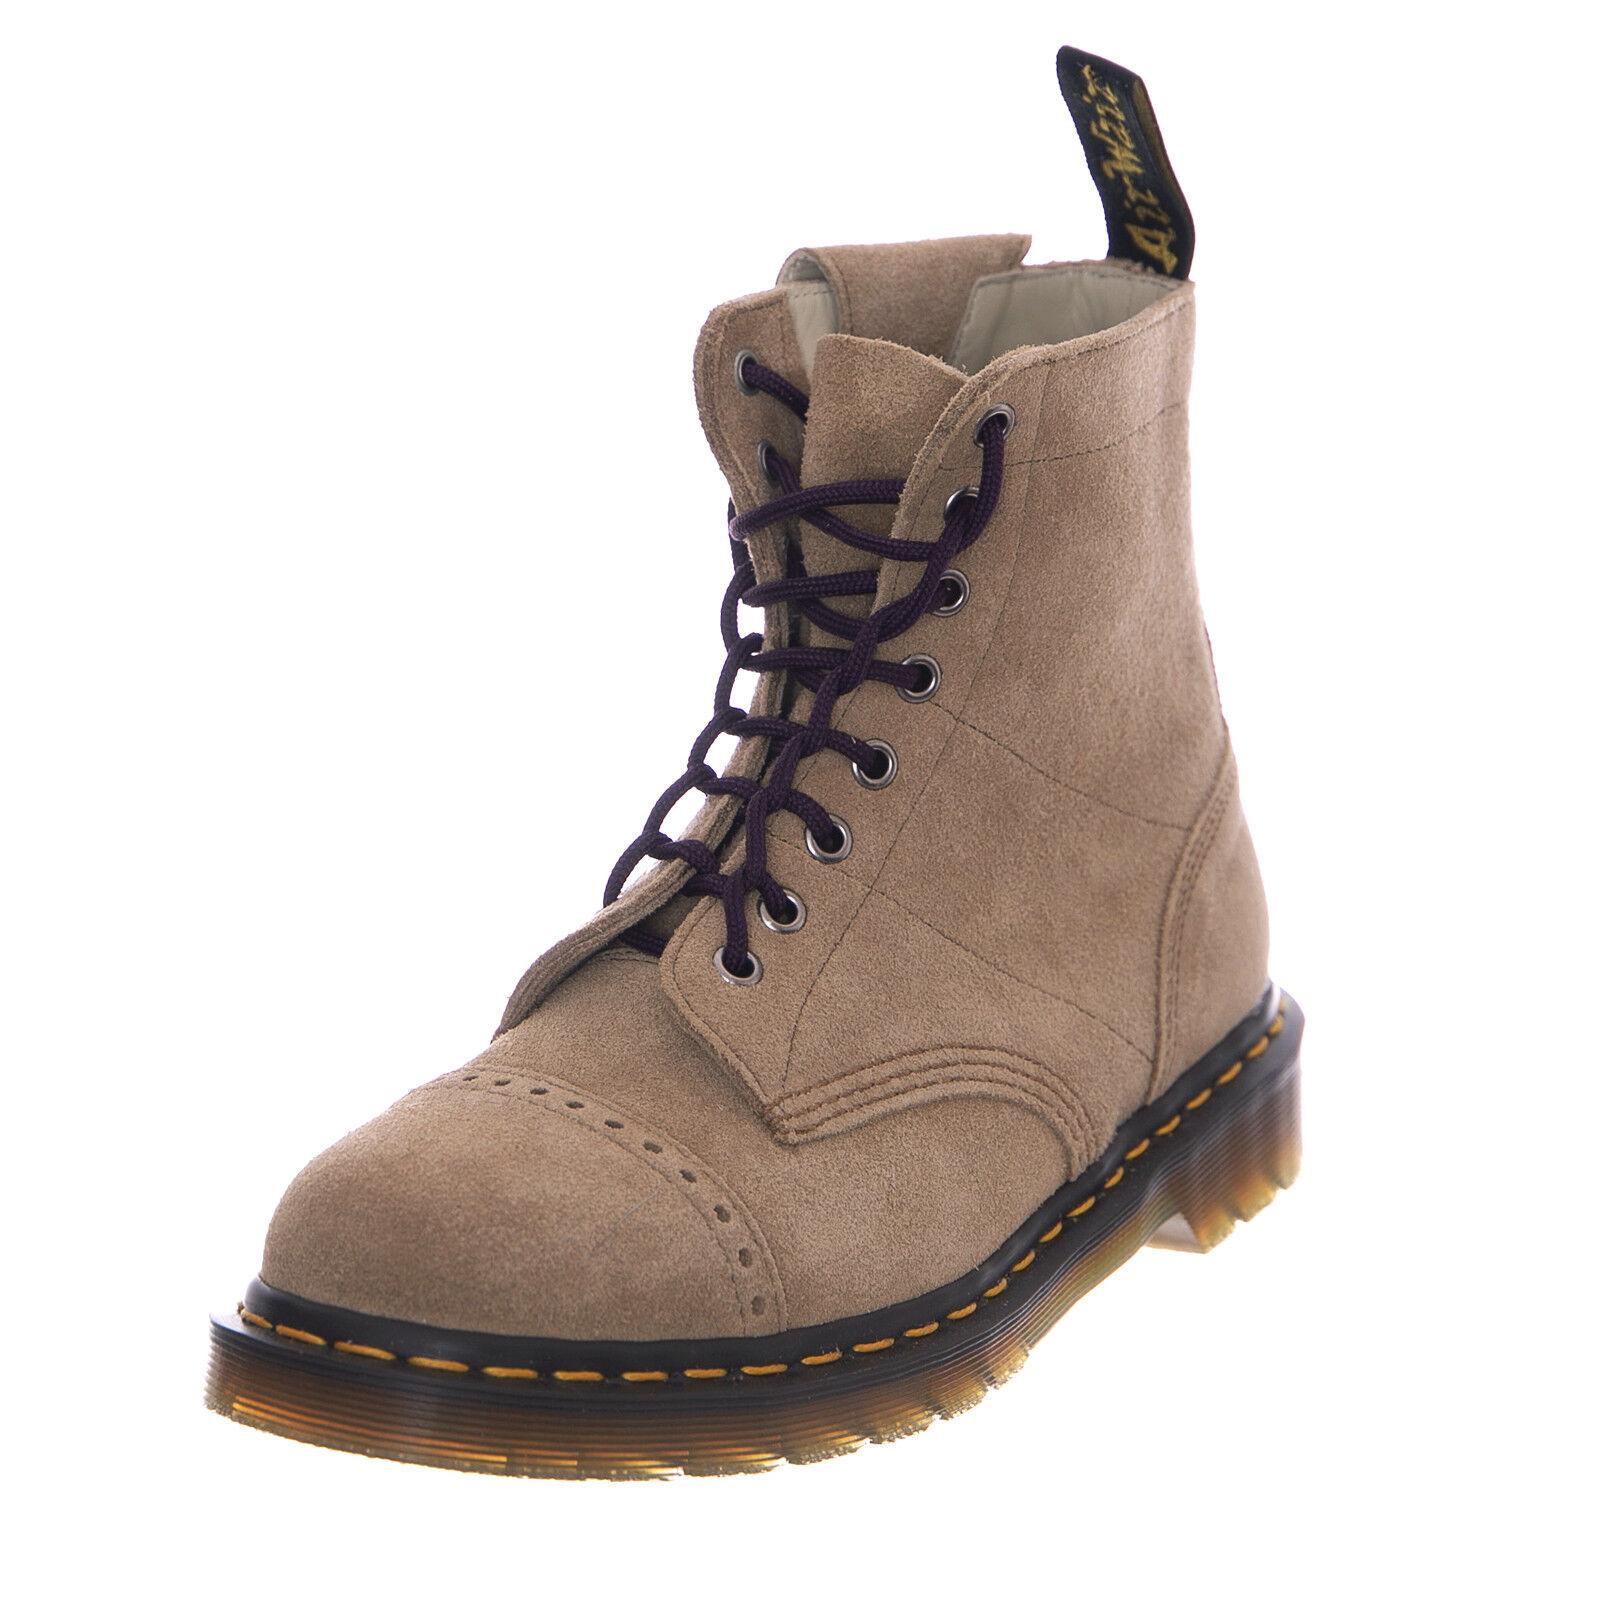 Dr.Martens Boots DR. Martens X Needles 1460 - Sand Desert Oasis Suede Beige